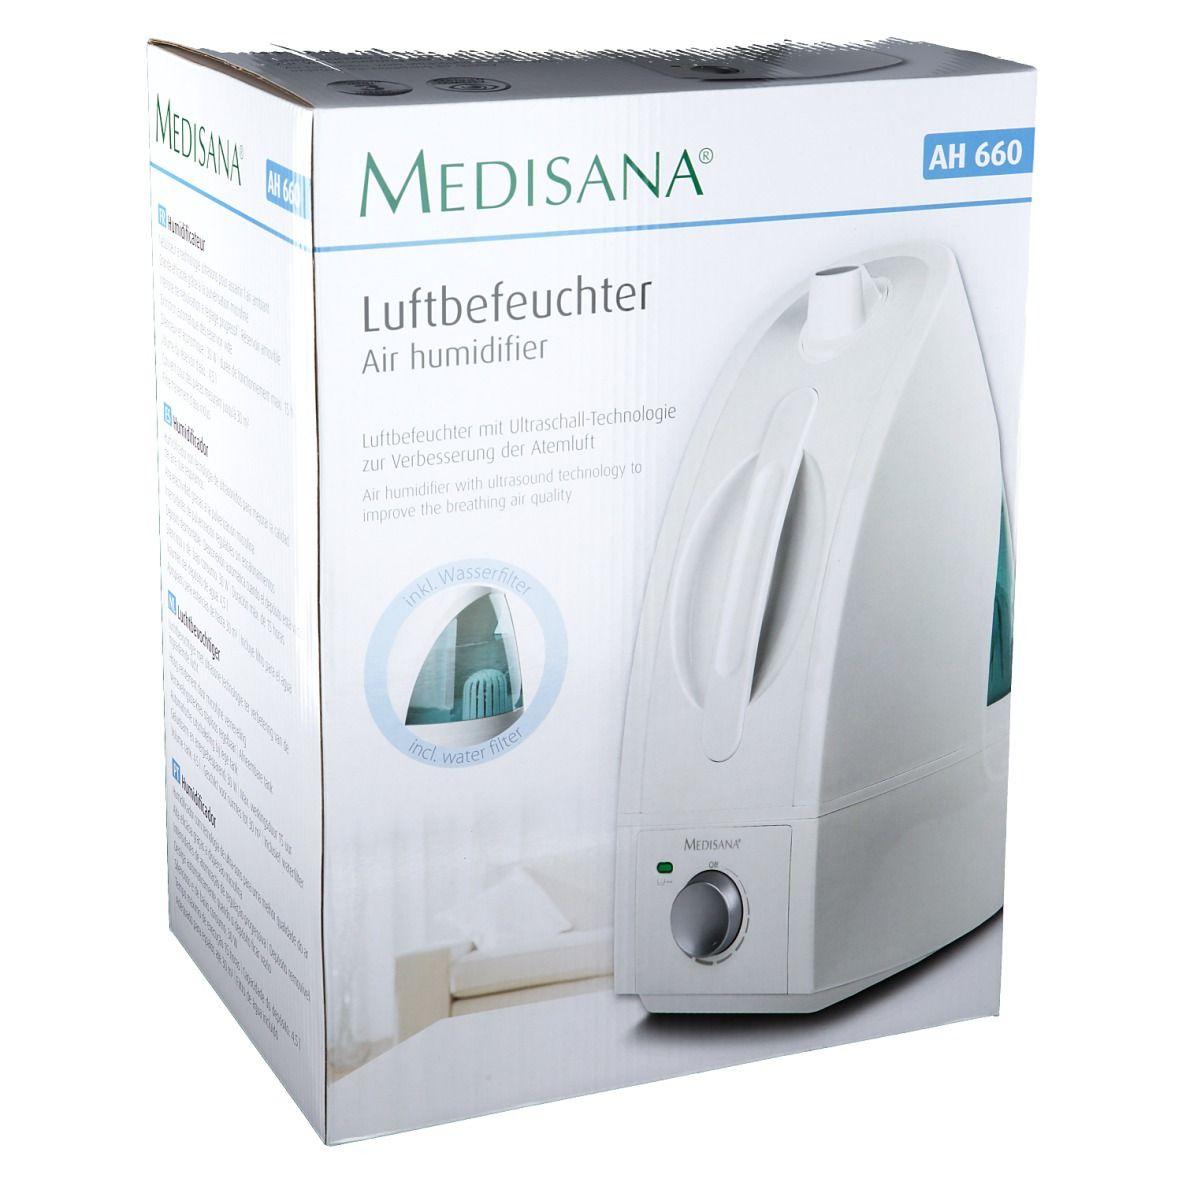 Medisana® Humidificateur d'Air AH660 pc(s) dispositif(s) de lecture